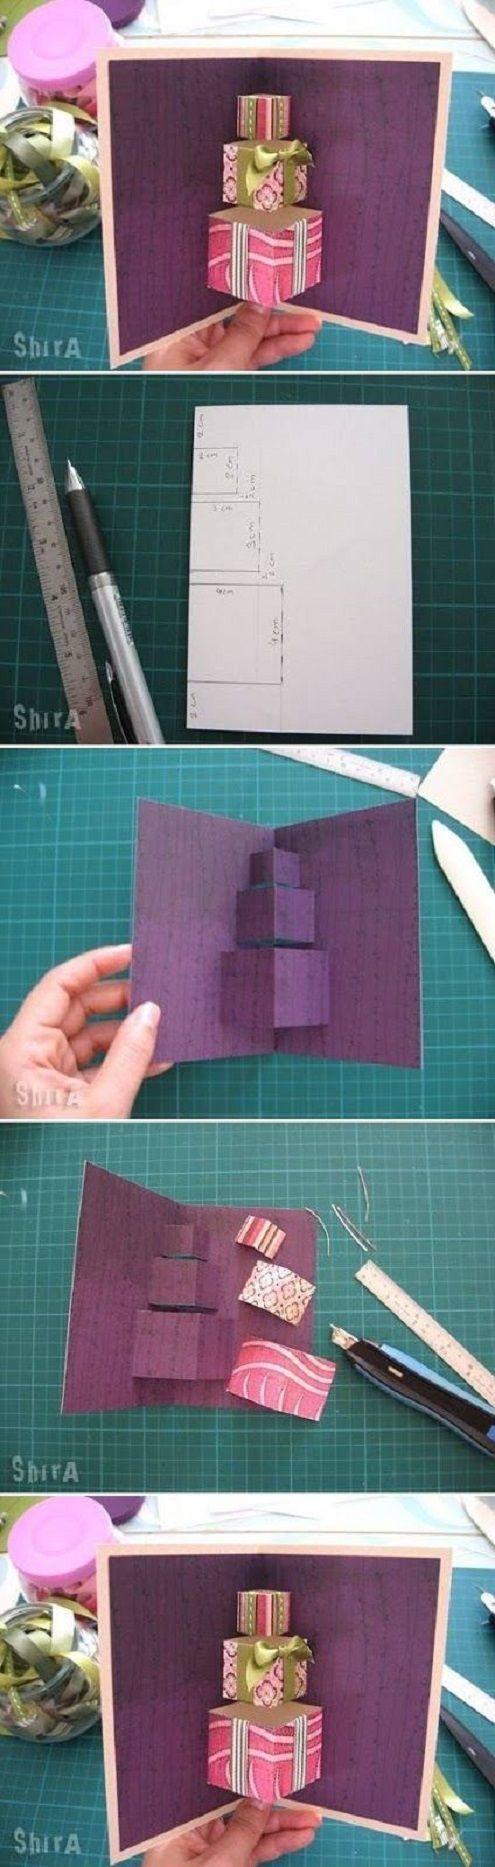 3D birthday card ideas easy to make